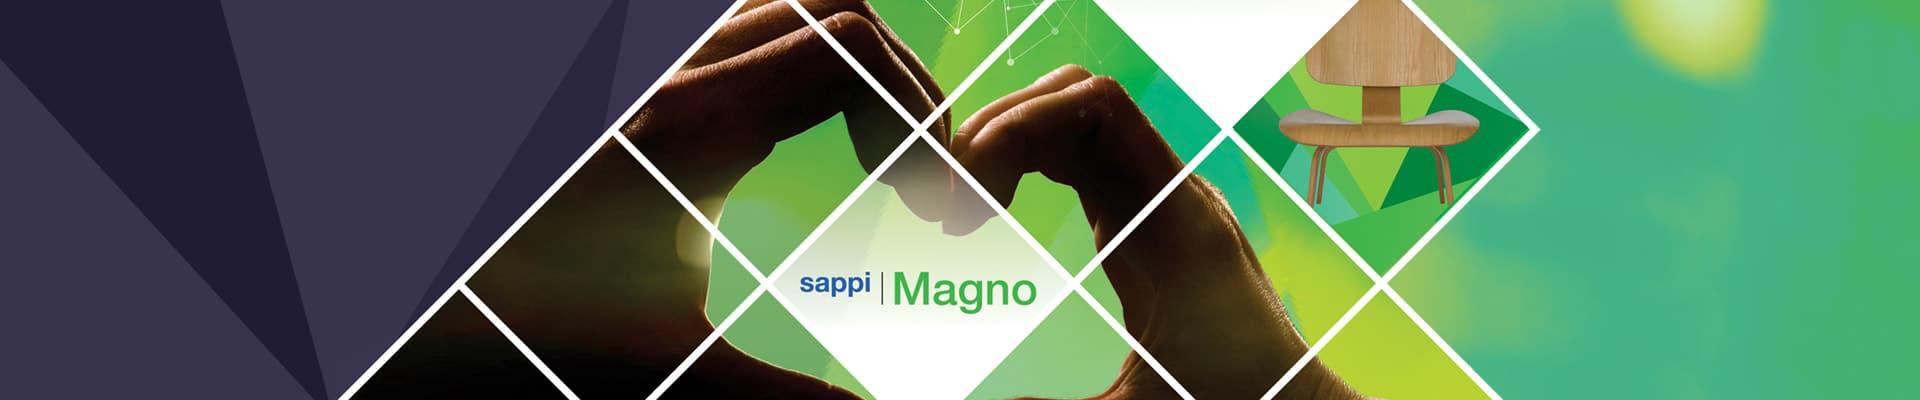 sappi-magno-reconnect-slide